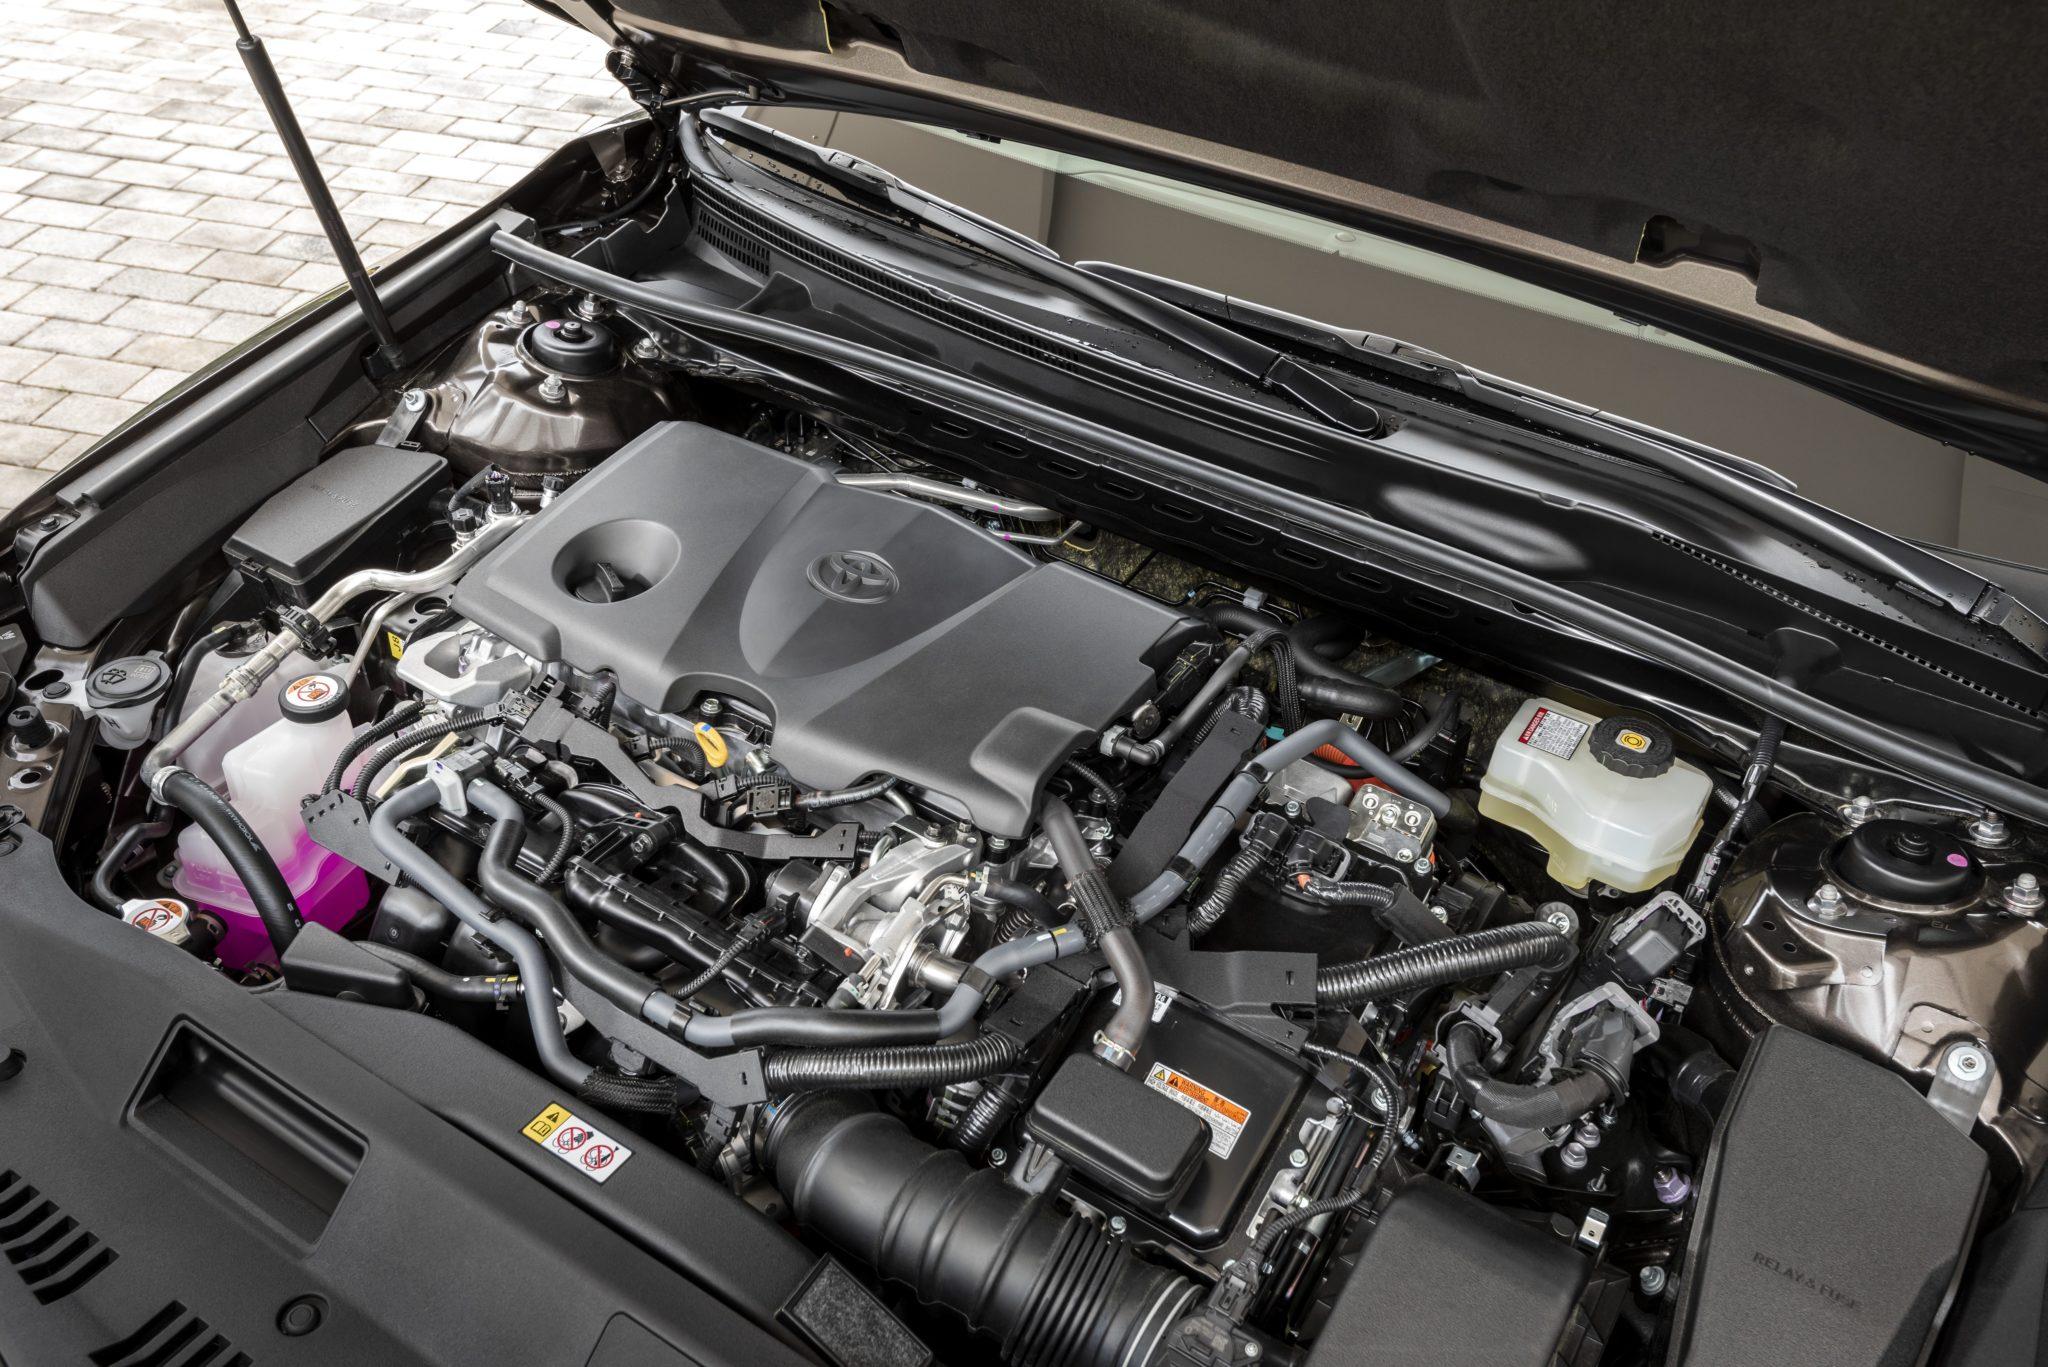 Motor híbrido 2.5 Dynamic Force de 160 kW/218 CV